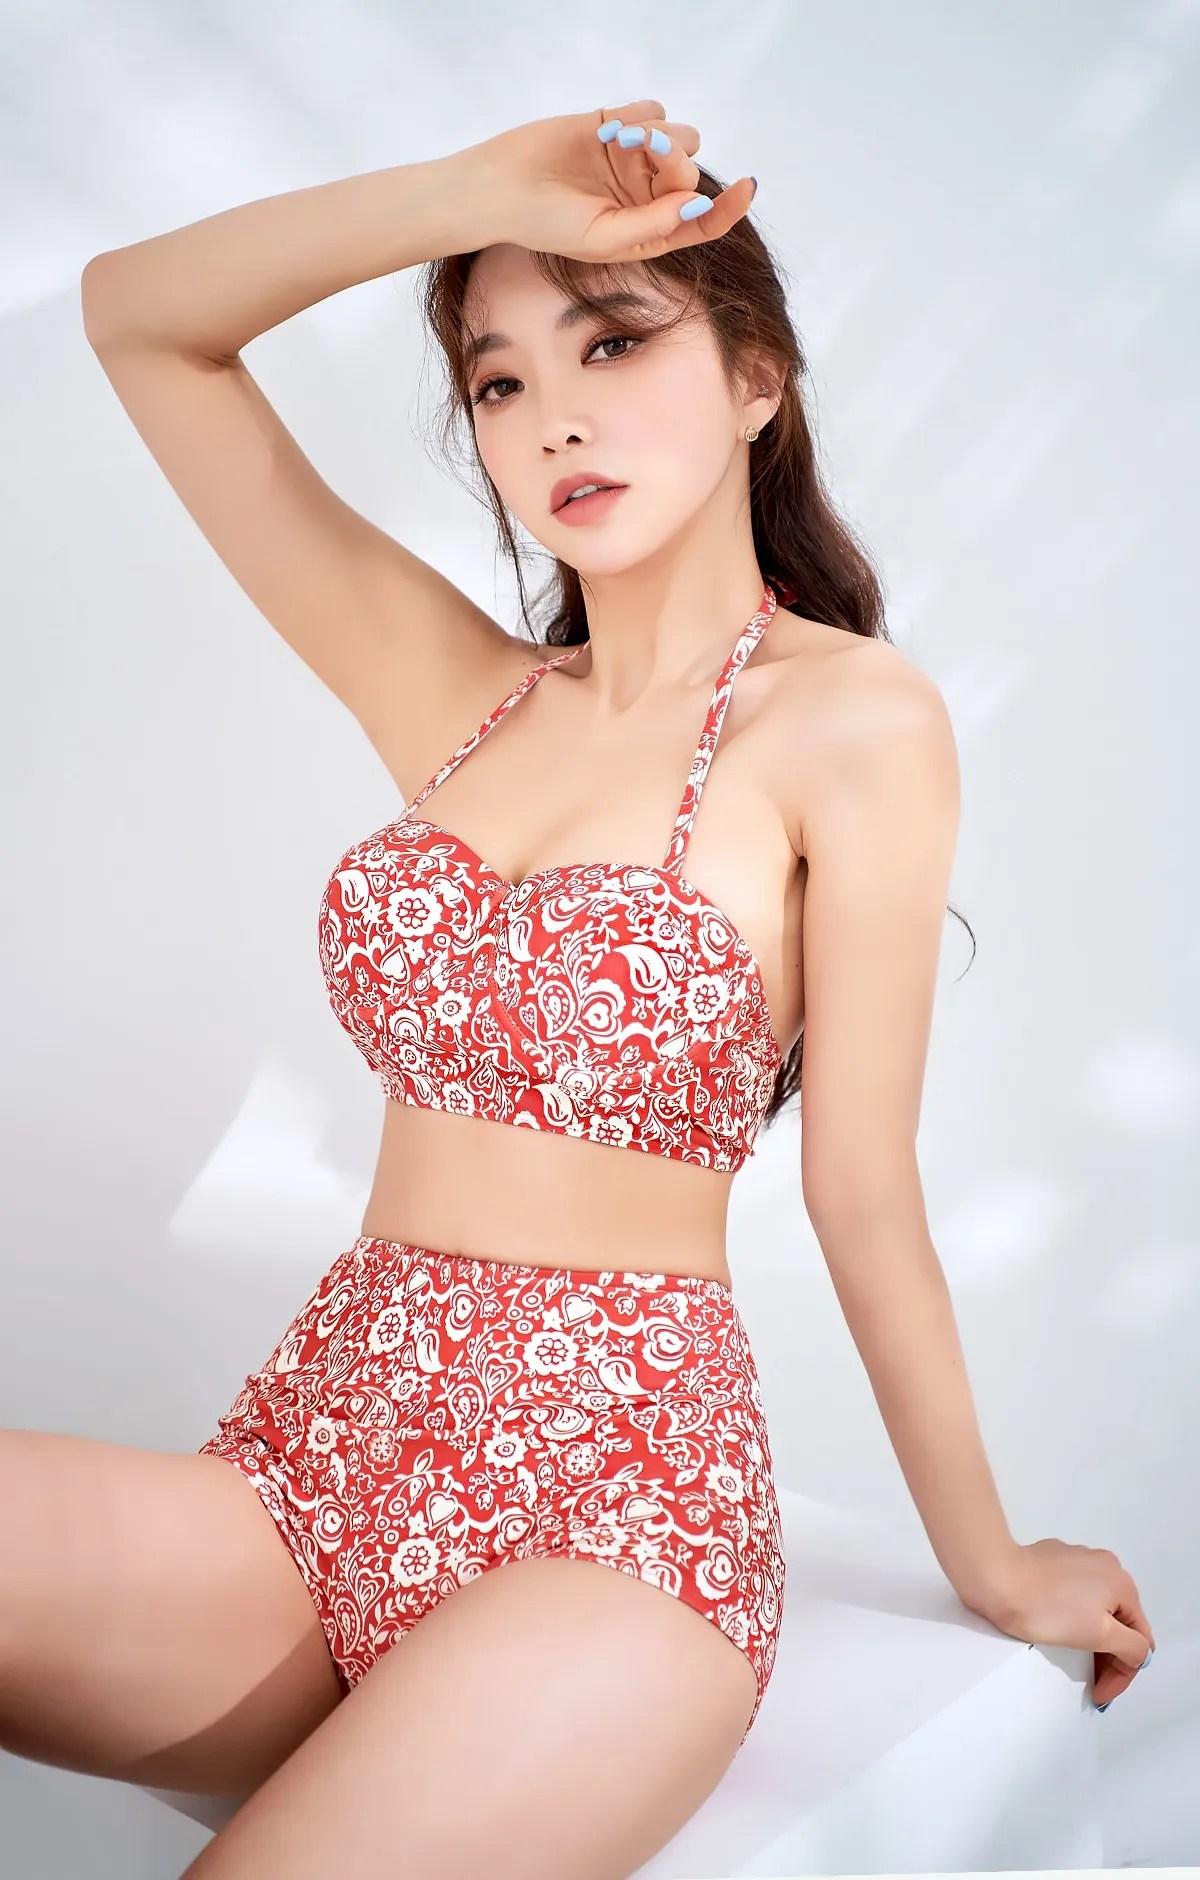 Park Suyeon / vendis / March 2021 / Indoor Beachwear Photoshoot Part 2